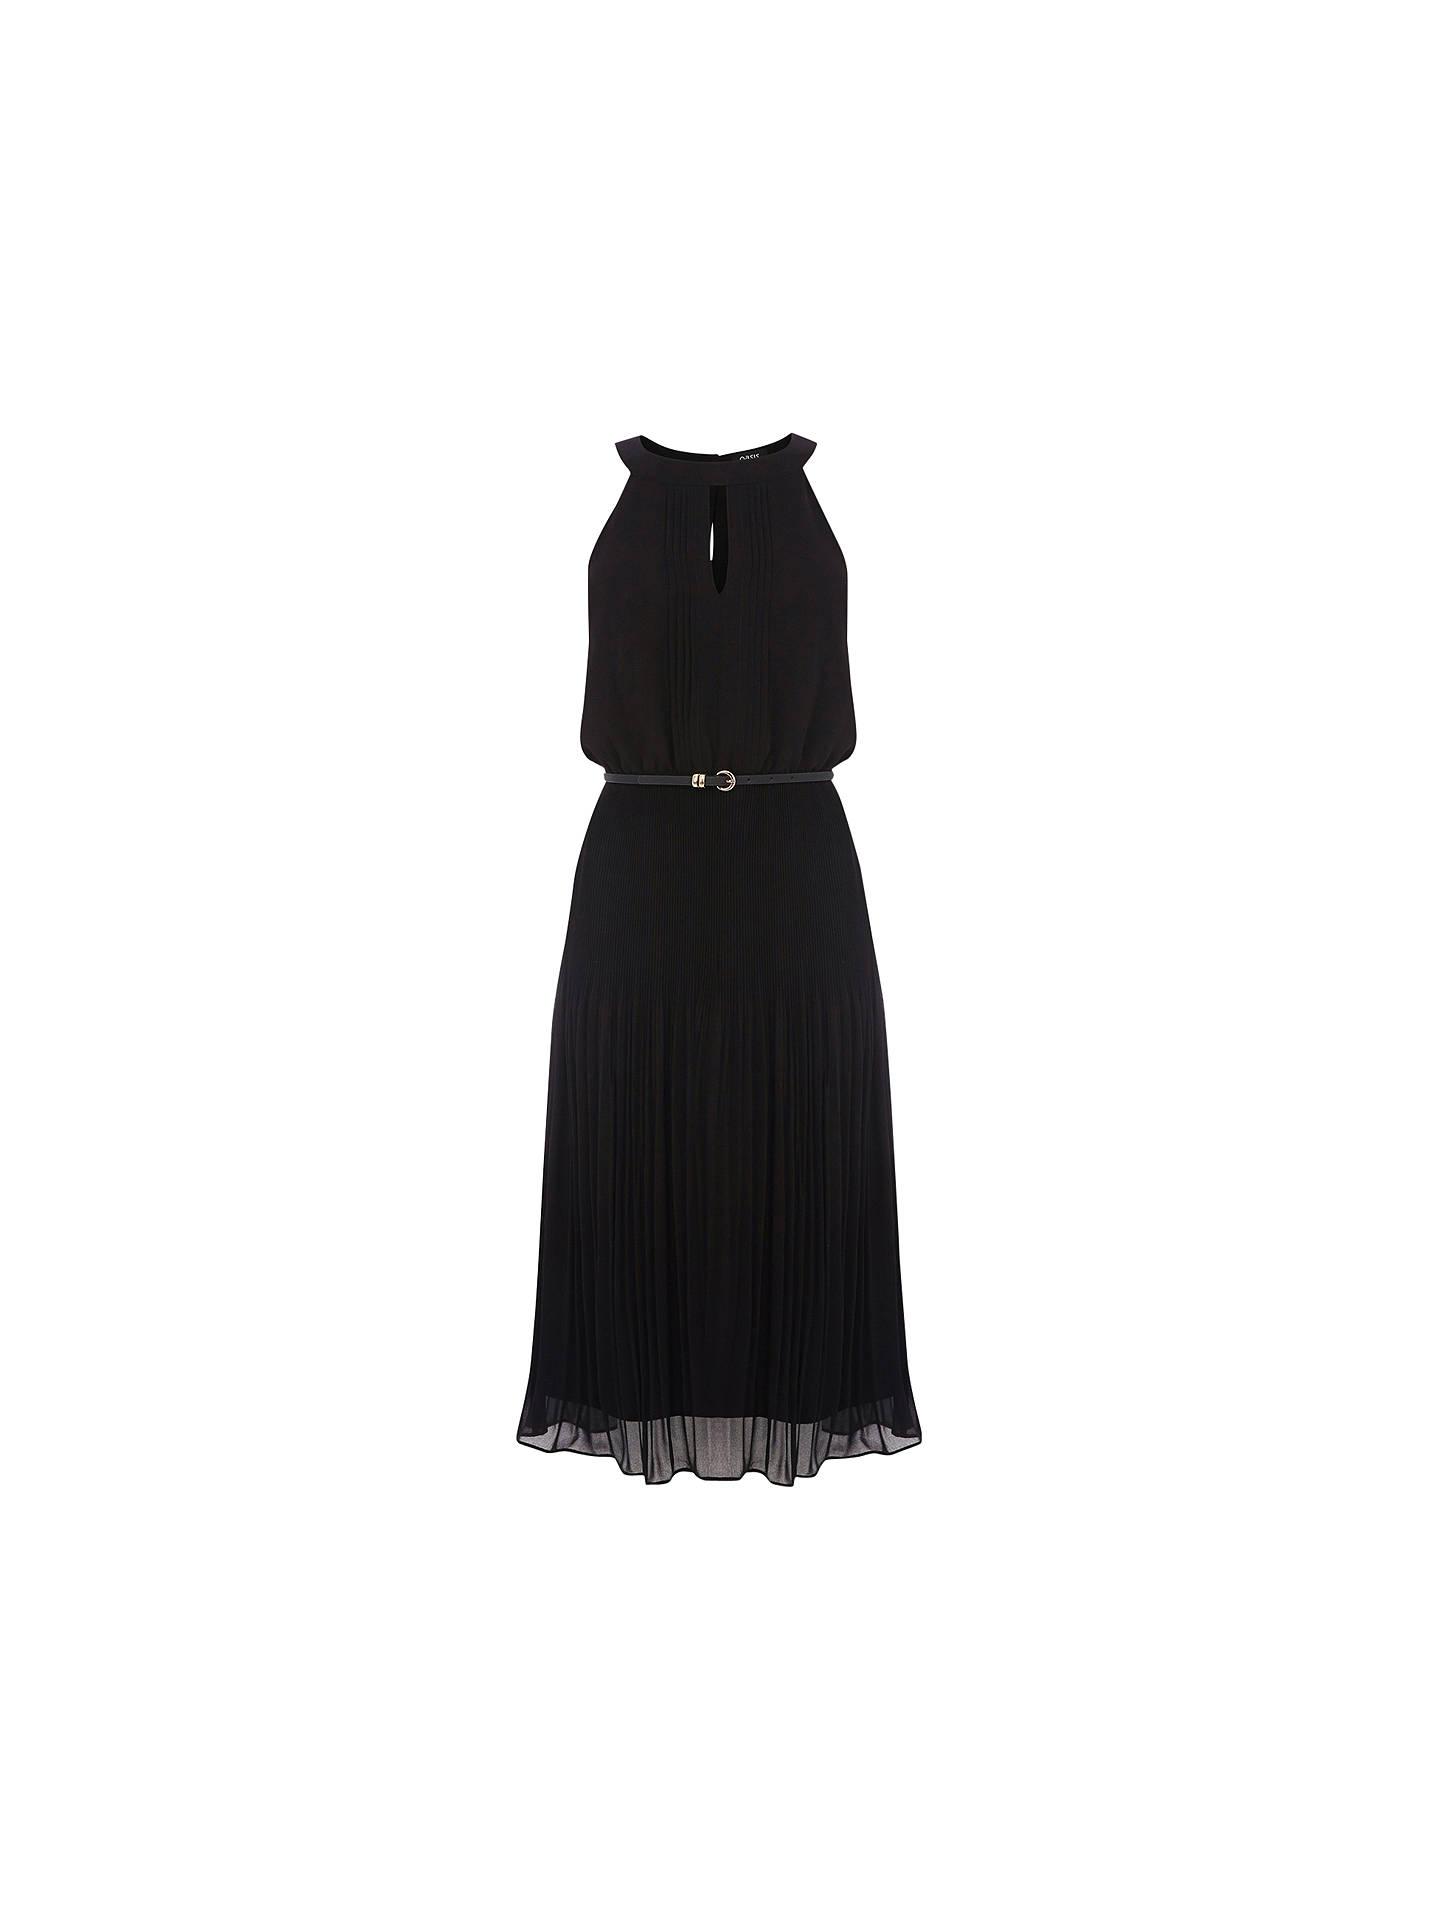 be718efa3e38 Buy Oasis Chiffon Pleated Midi Dress, Black, 8 Online at johnlewis.com ...